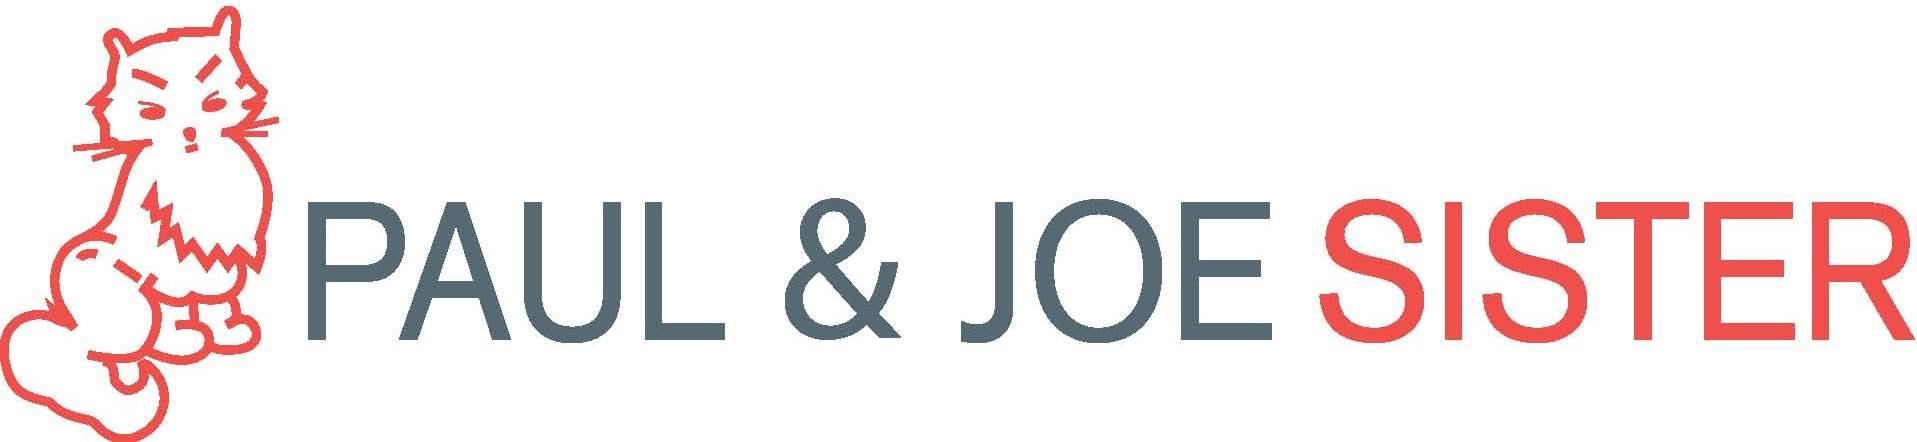 logo sister new pantone pdf.jpg